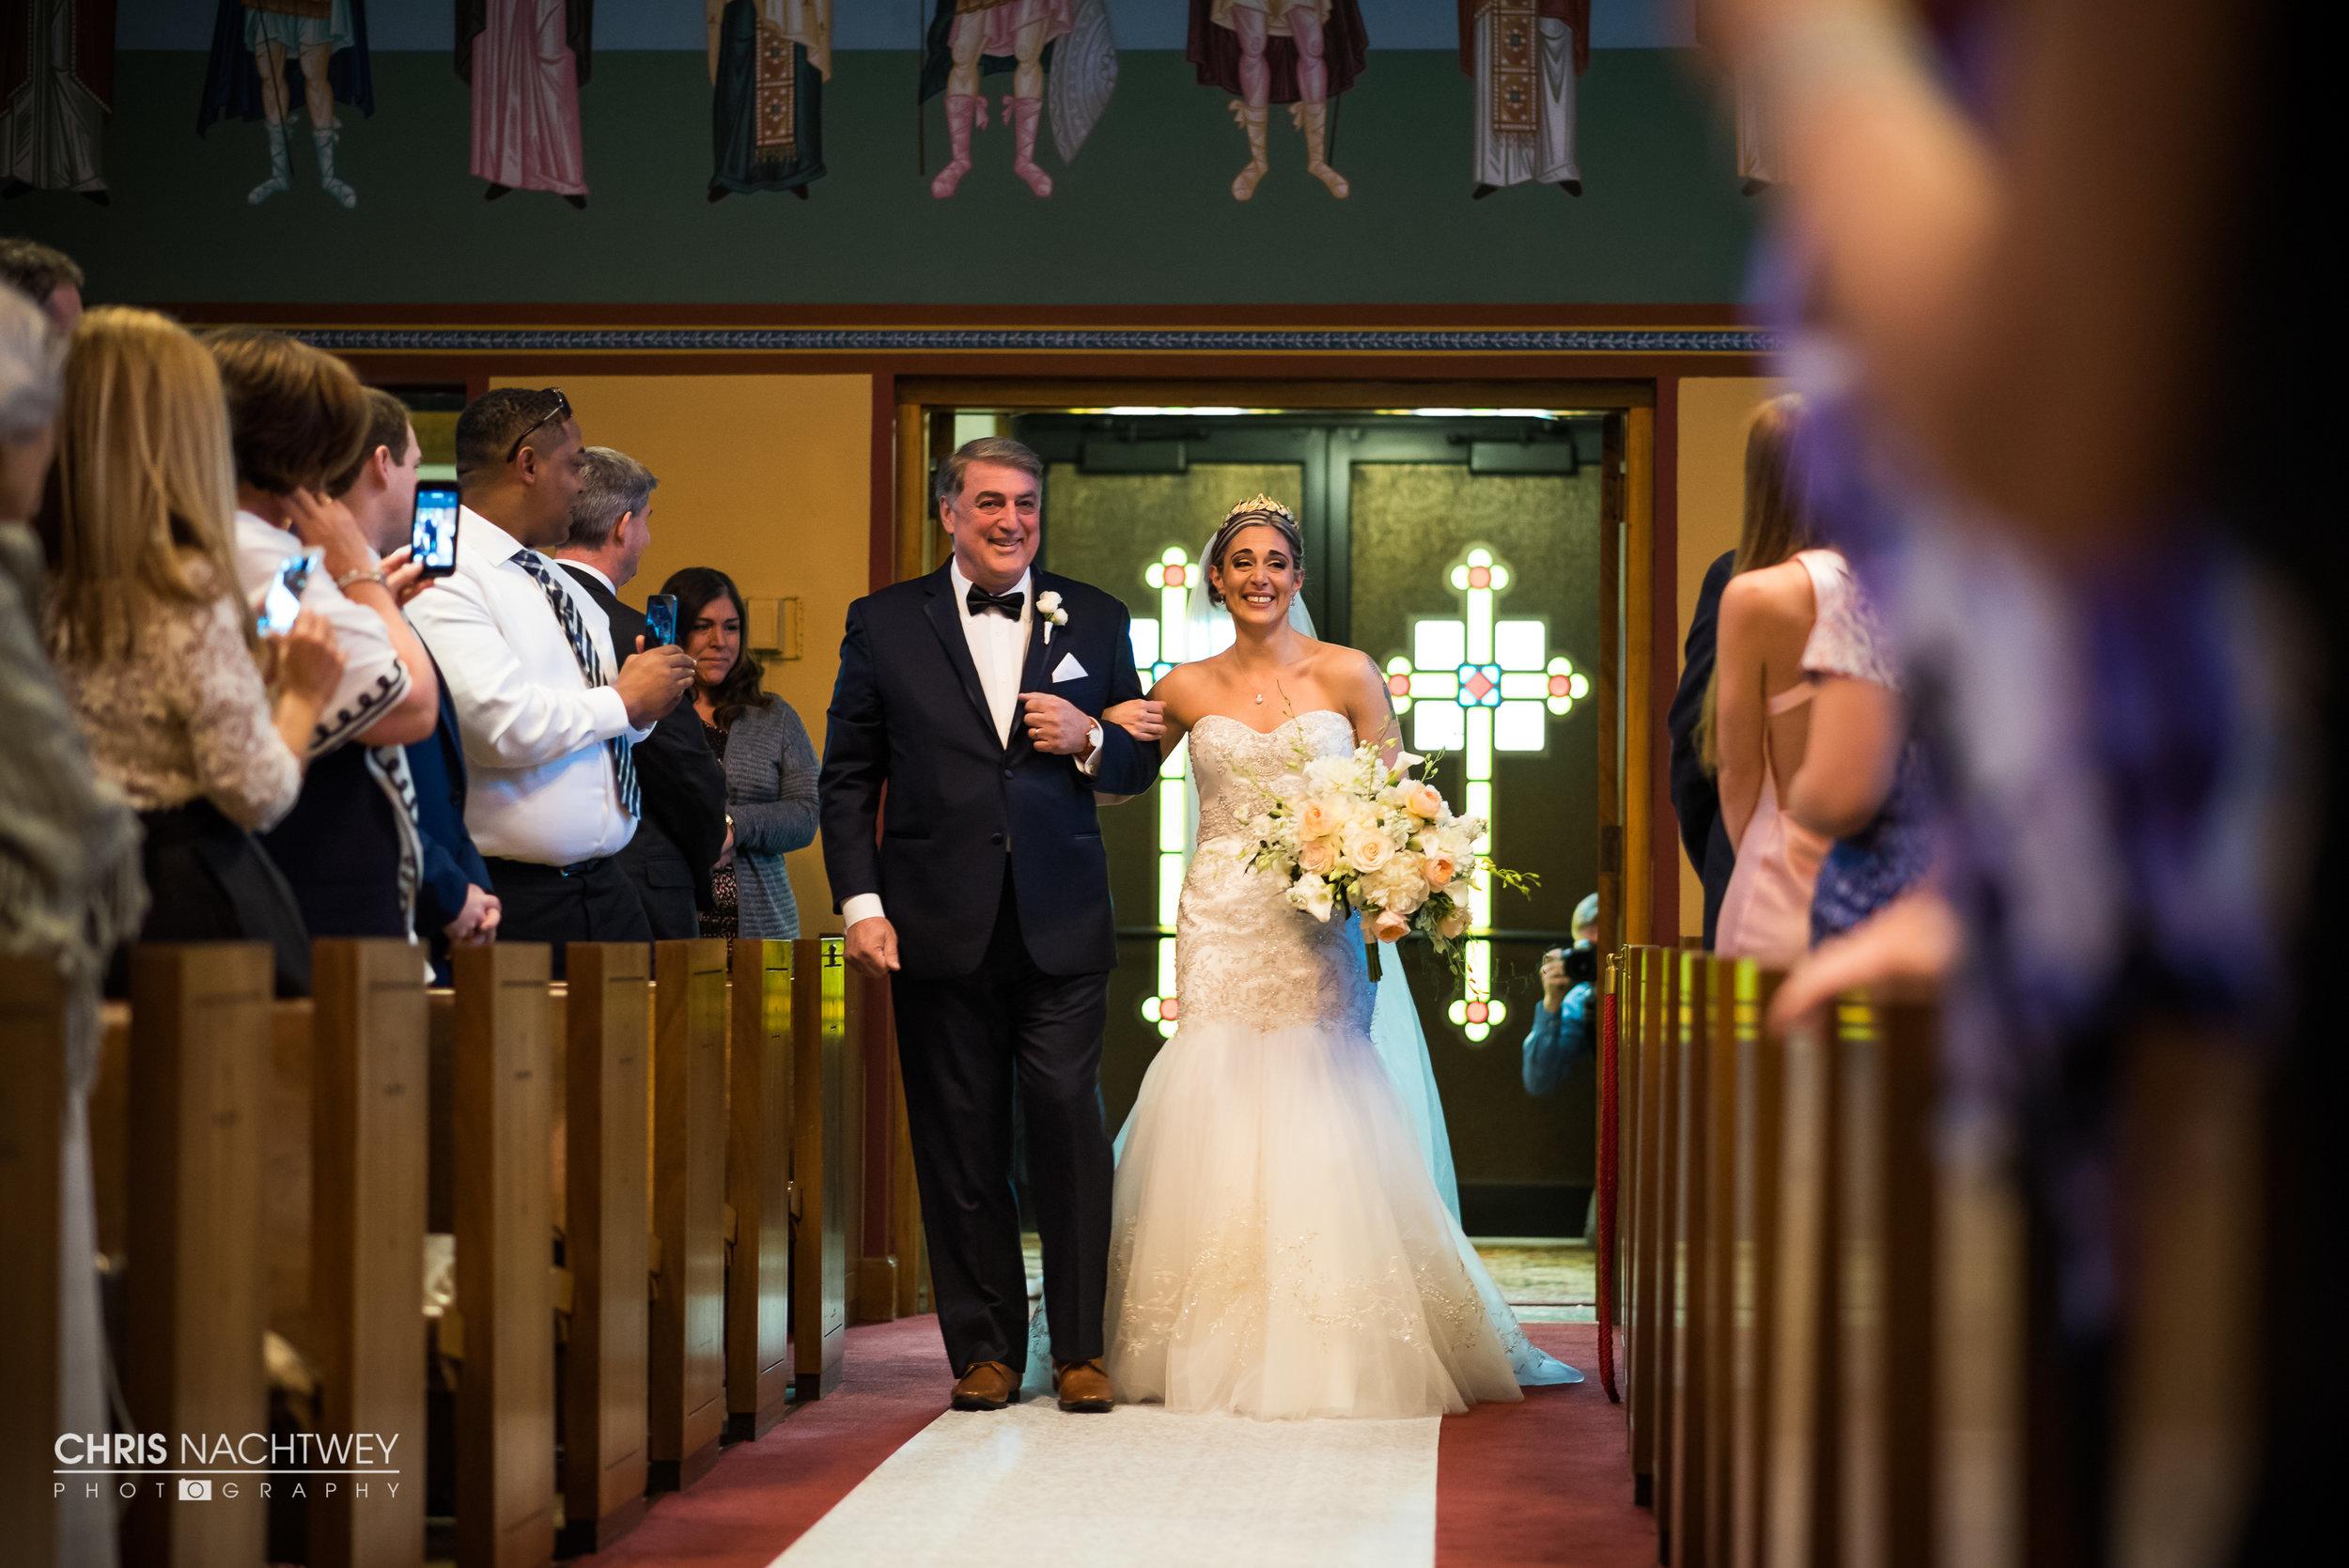 mystic-artistic-wedding-photographer-chris-nachtwey-2017-10.jpg